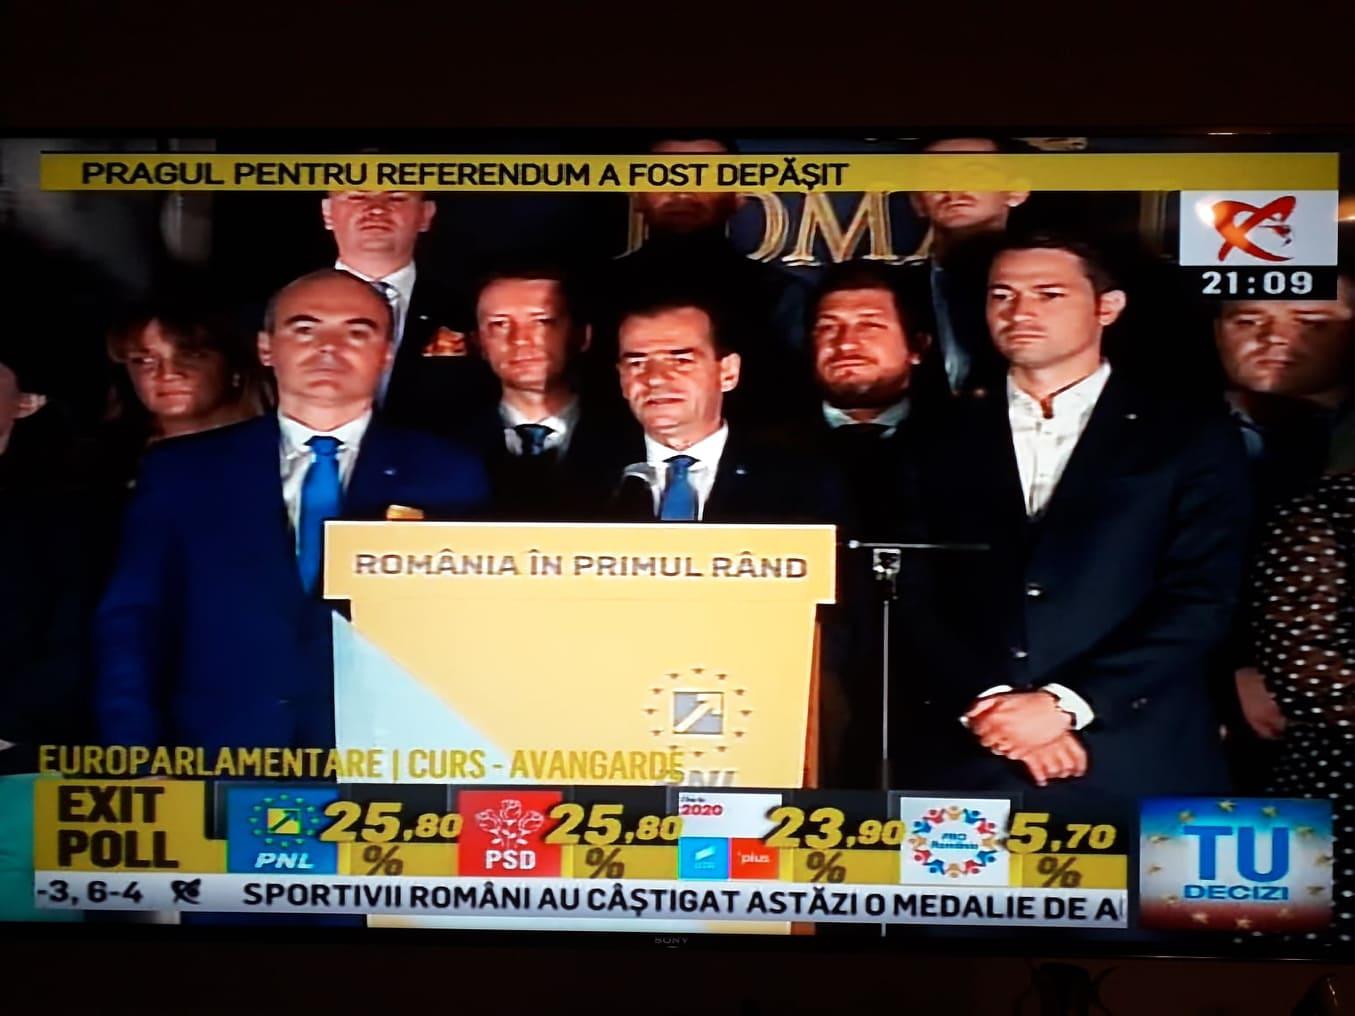 Exit-poll CURS-Avangarde: PSD - 25,8%, PNL -25,8 %, Alianta USR PLUS - 23,9 %